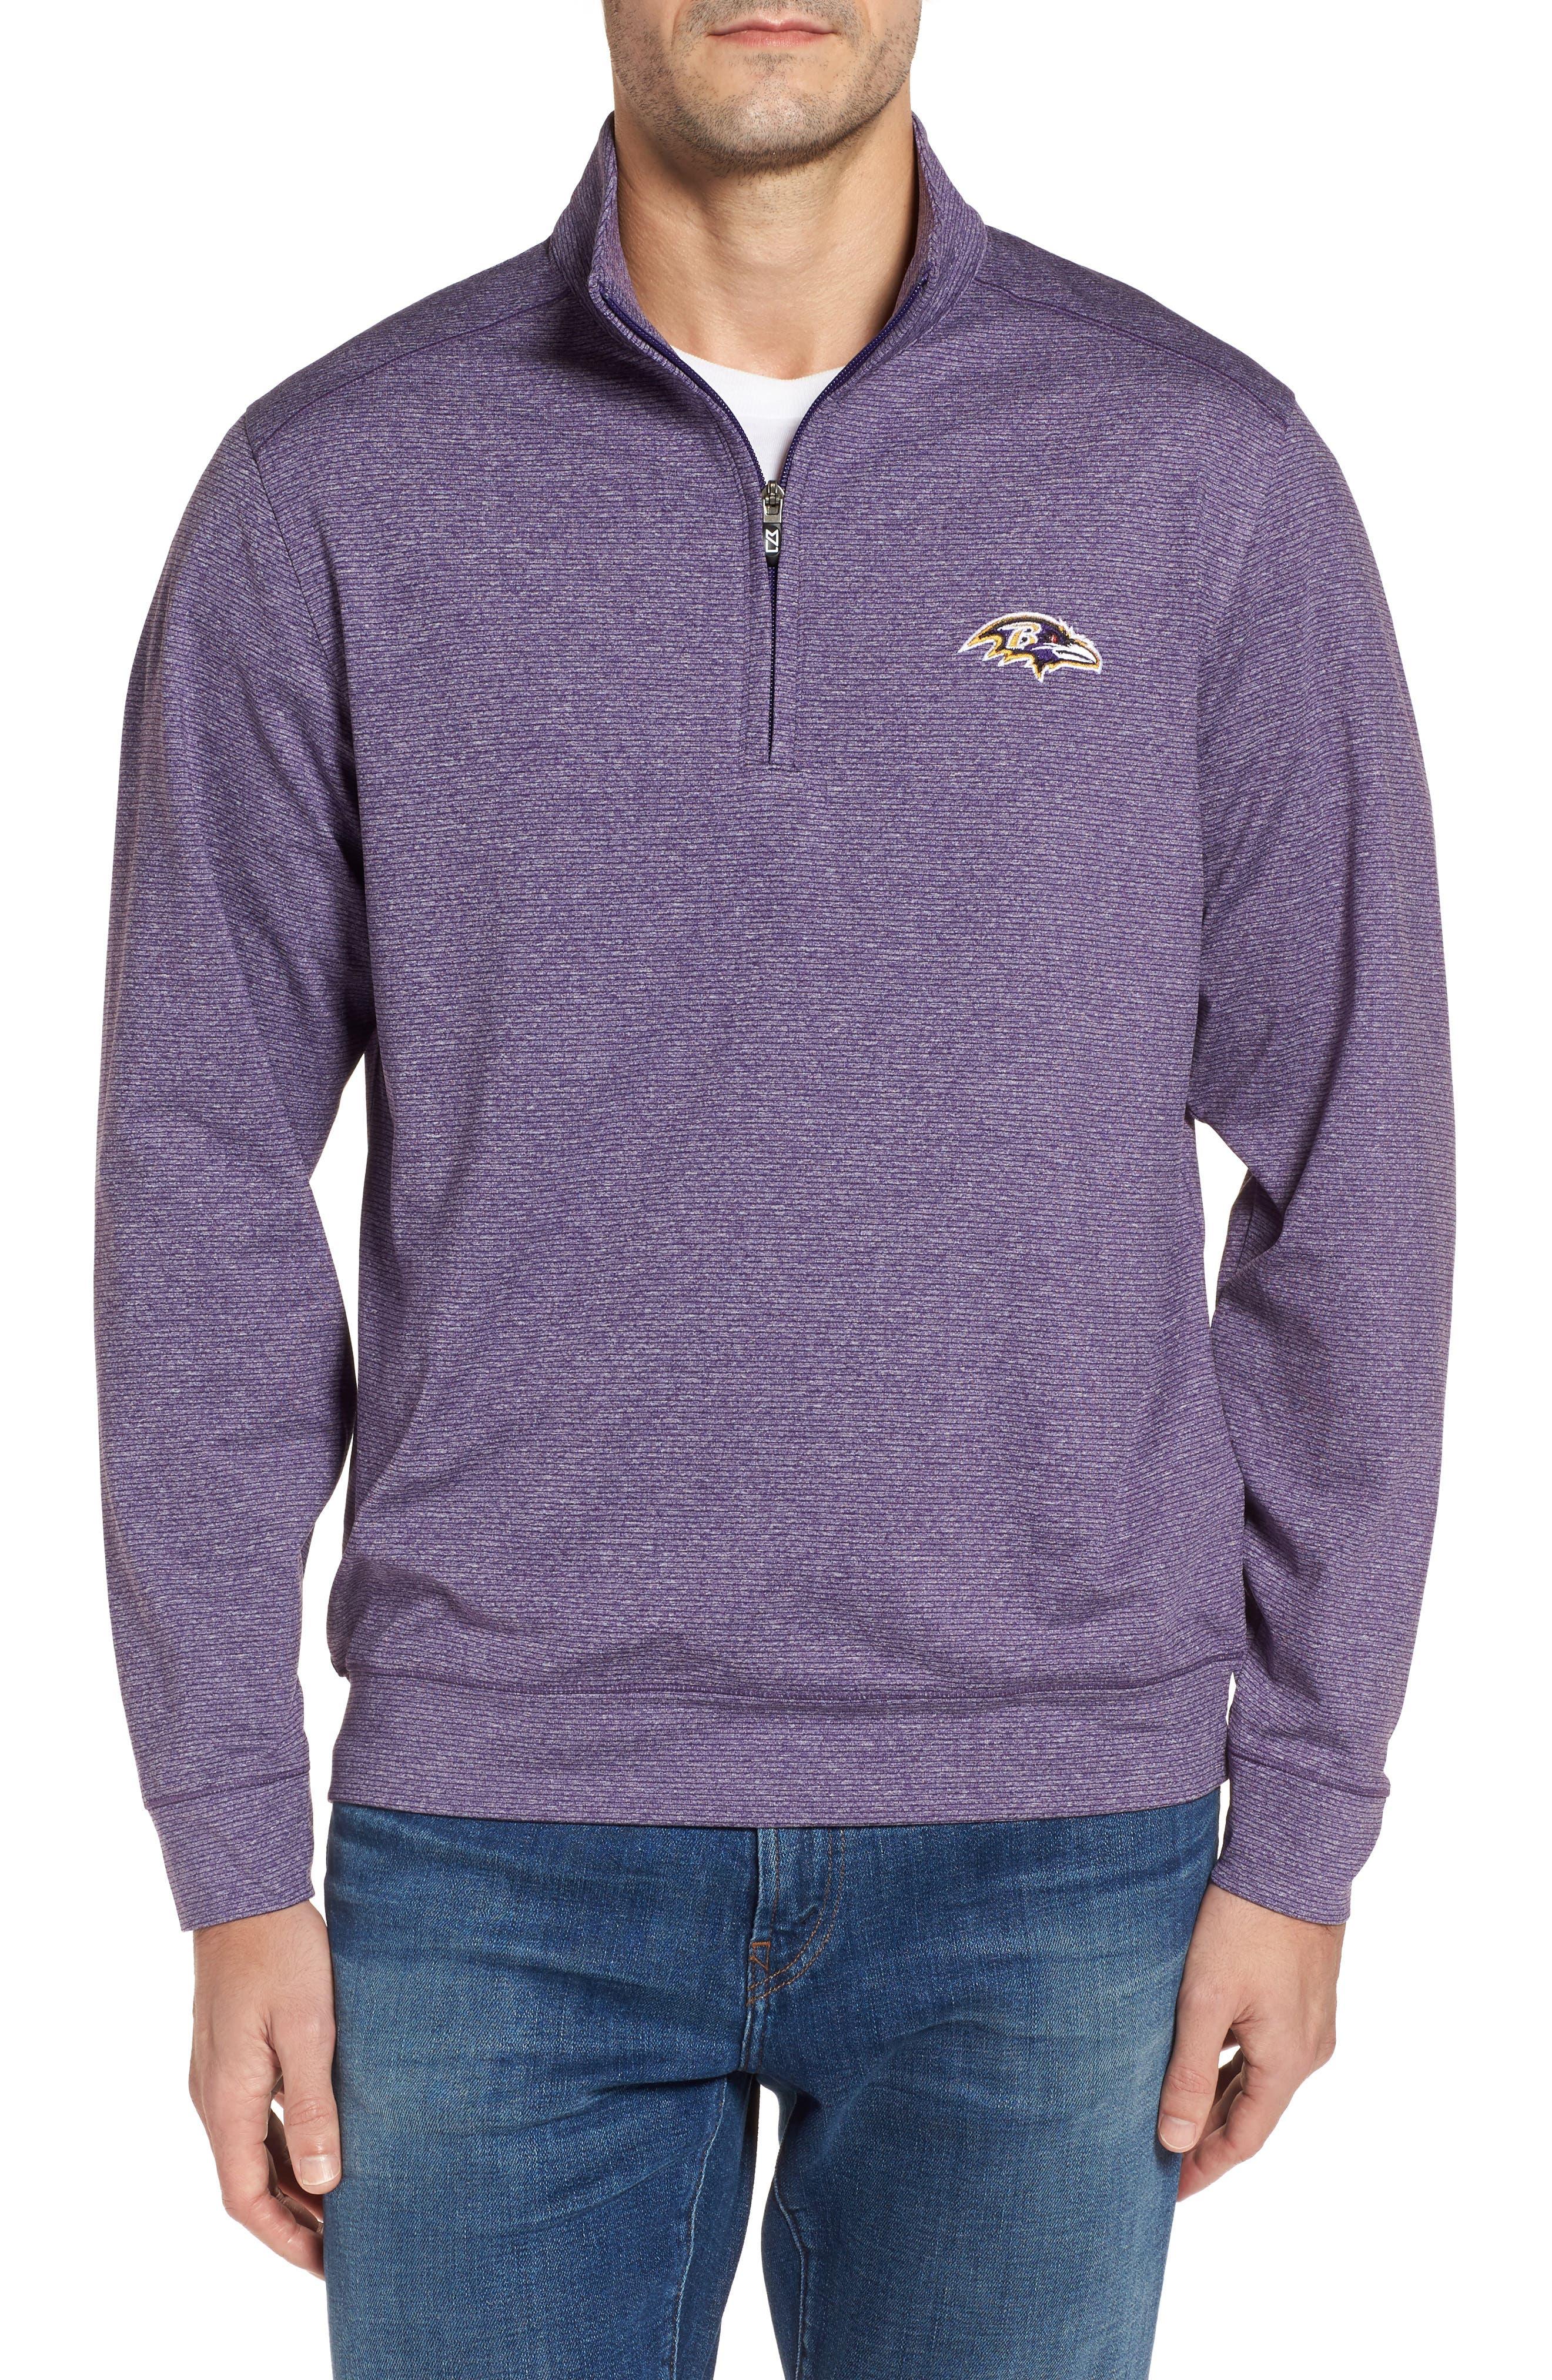 Shoreline - Baltimore Ravens Half Zip Pullover,                         Main,                         color, College Purple Heather